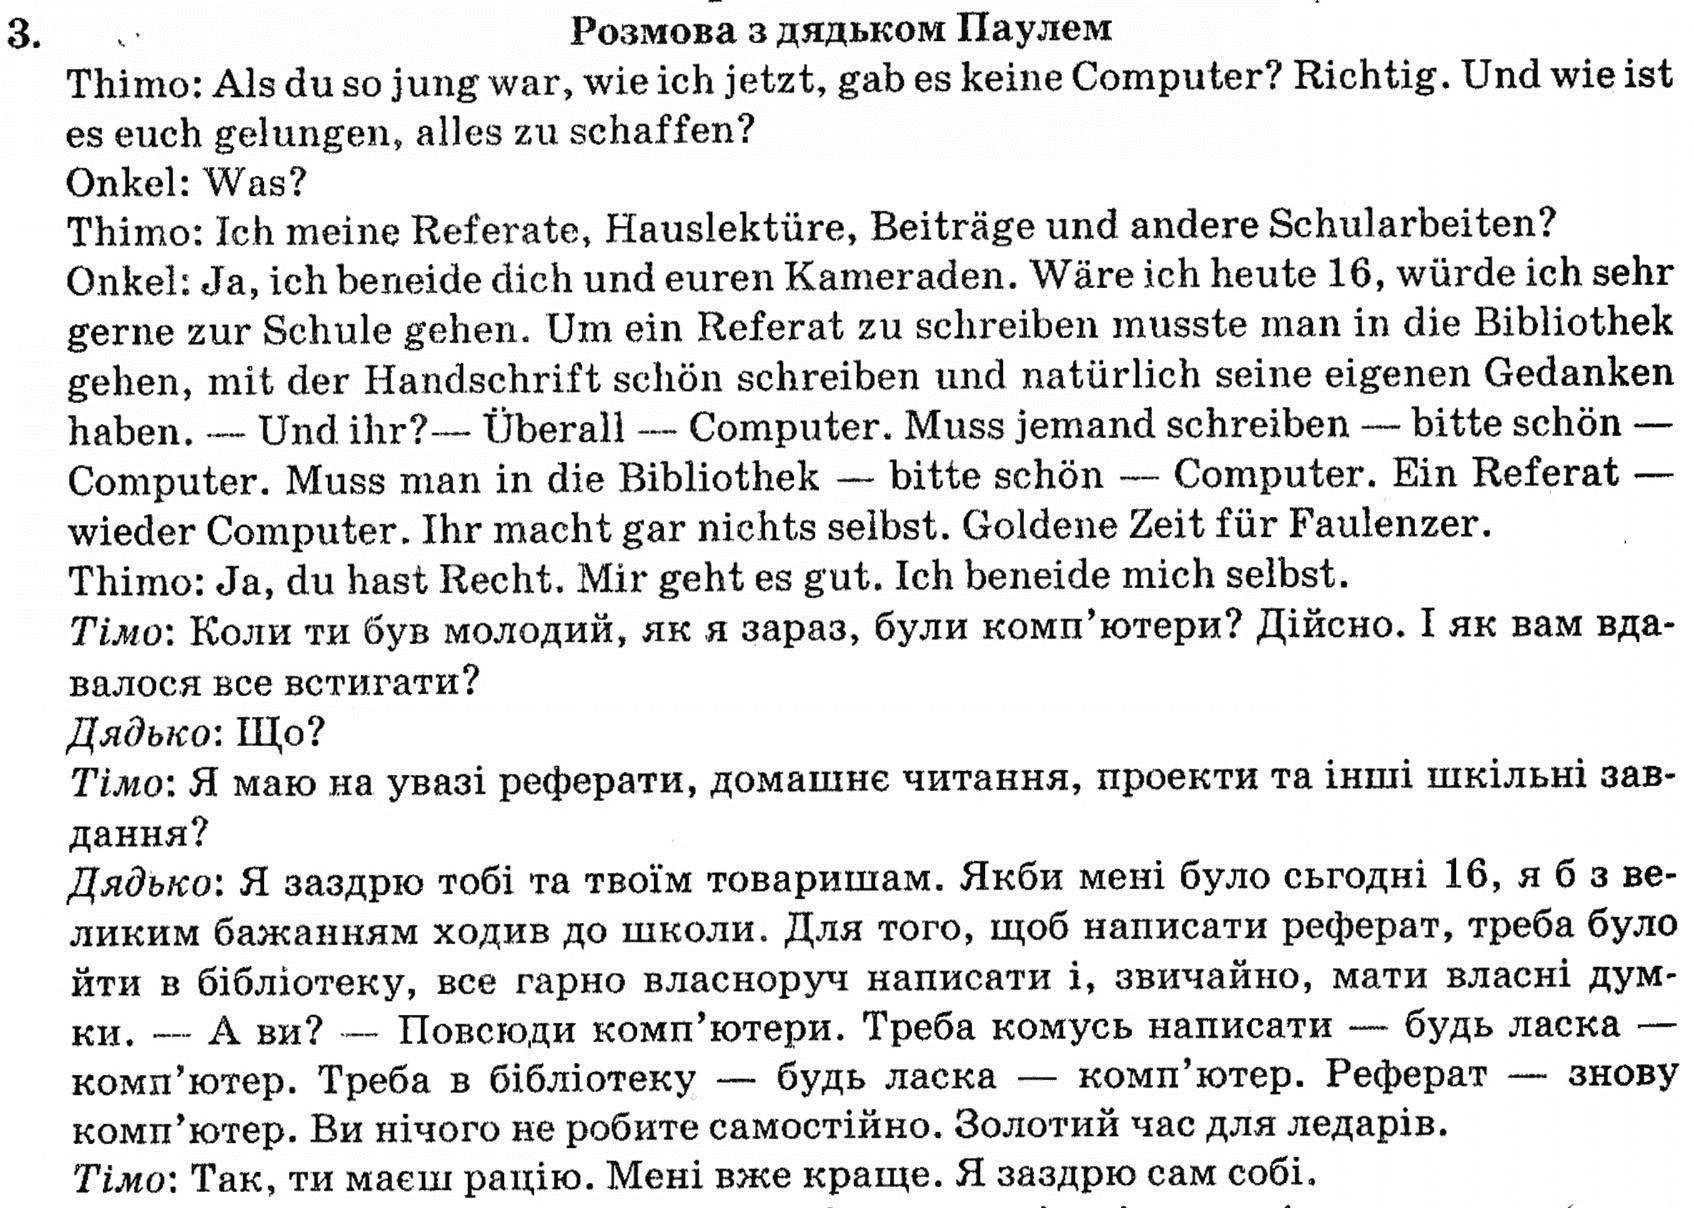 гдз по немецкому языку за 9 класс кириленко орап